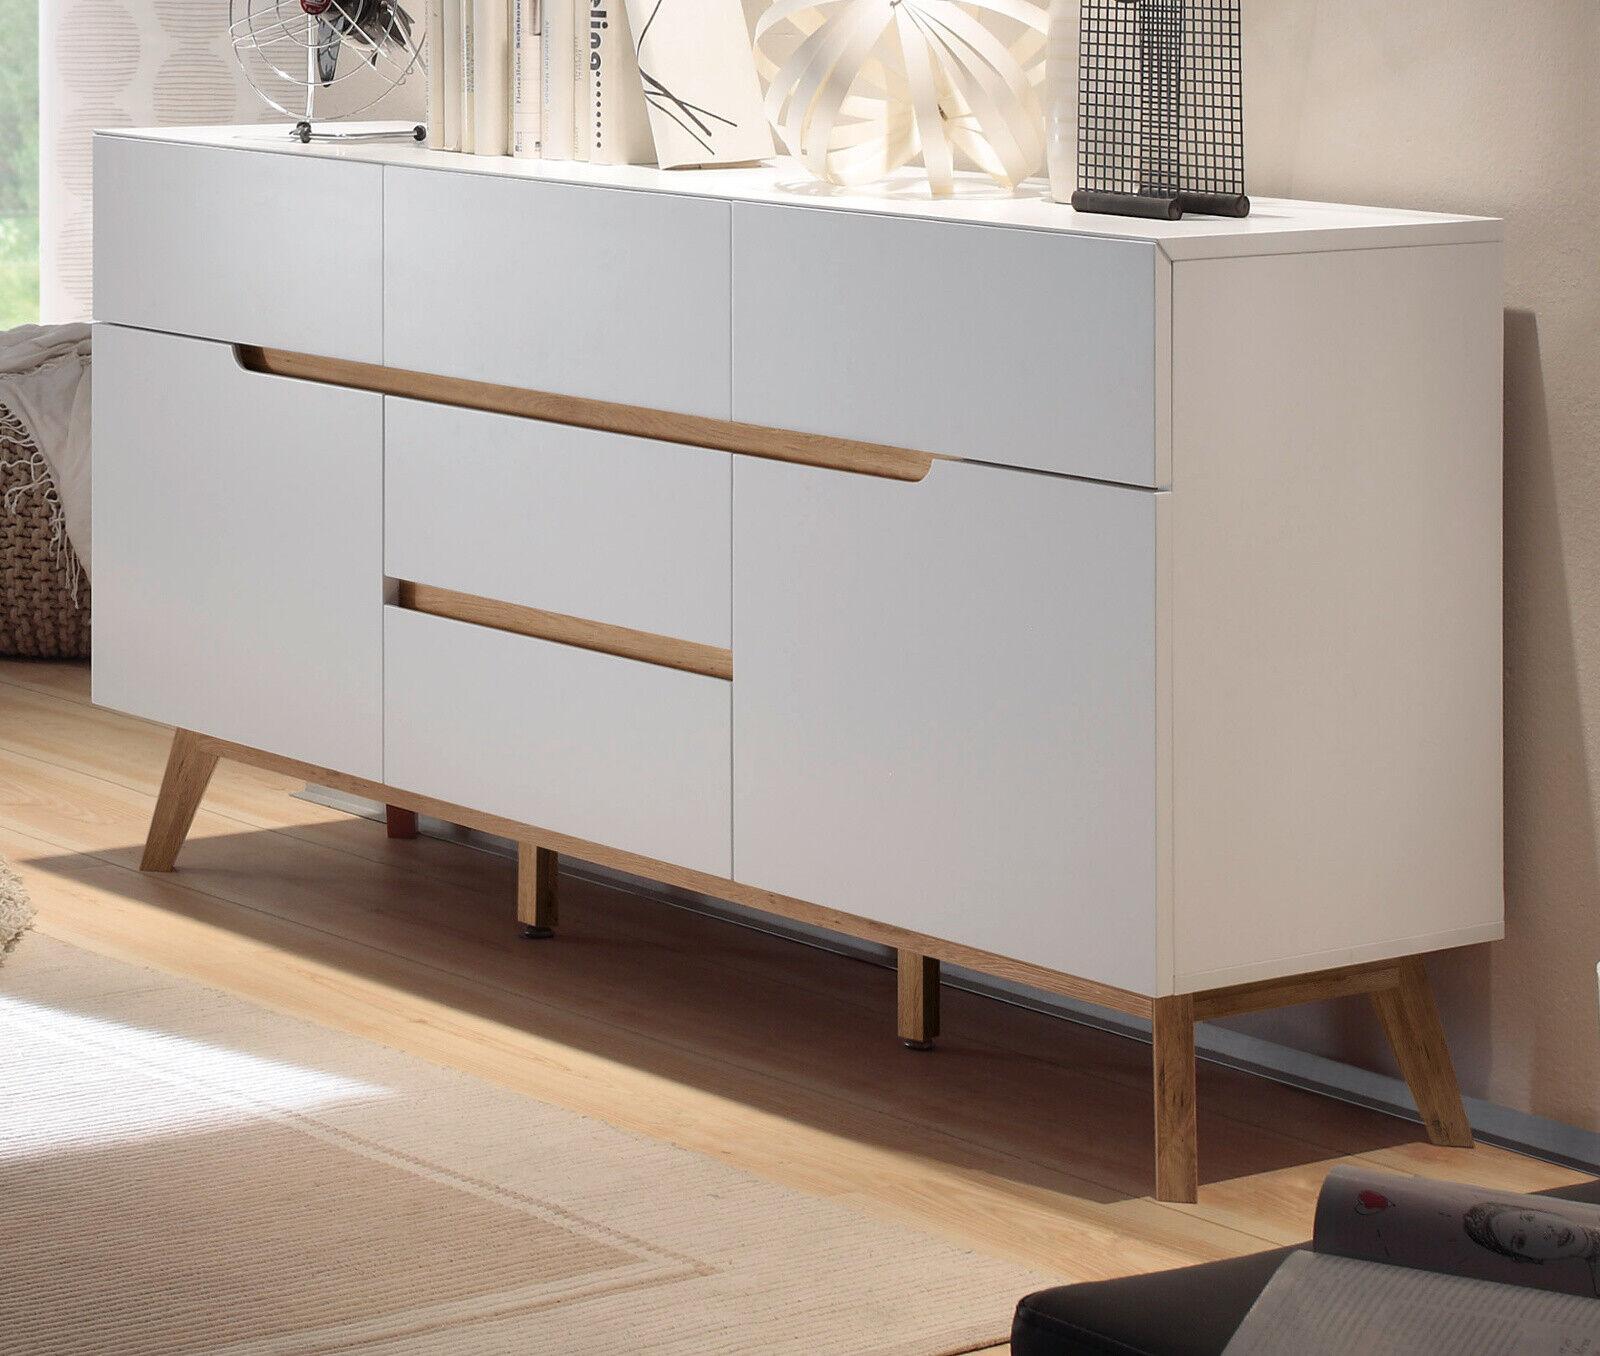 Anrichte Art Deco Kommode Loft Studio Sideboard Industrial Schubldenschrank